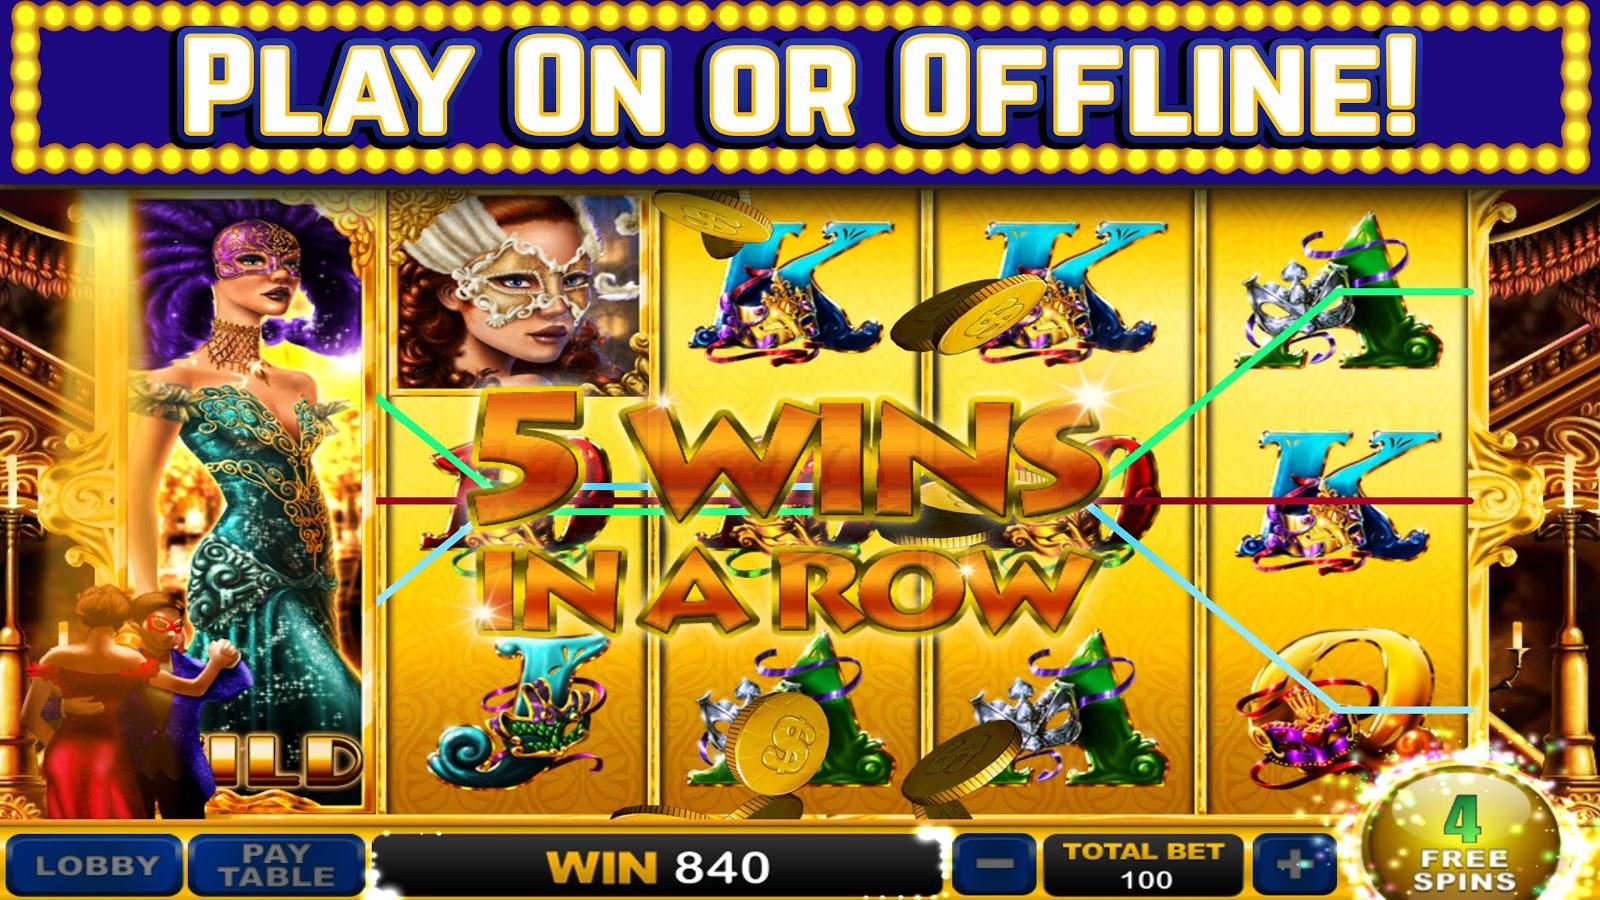 royal vegas online casino download online slots kostenlos